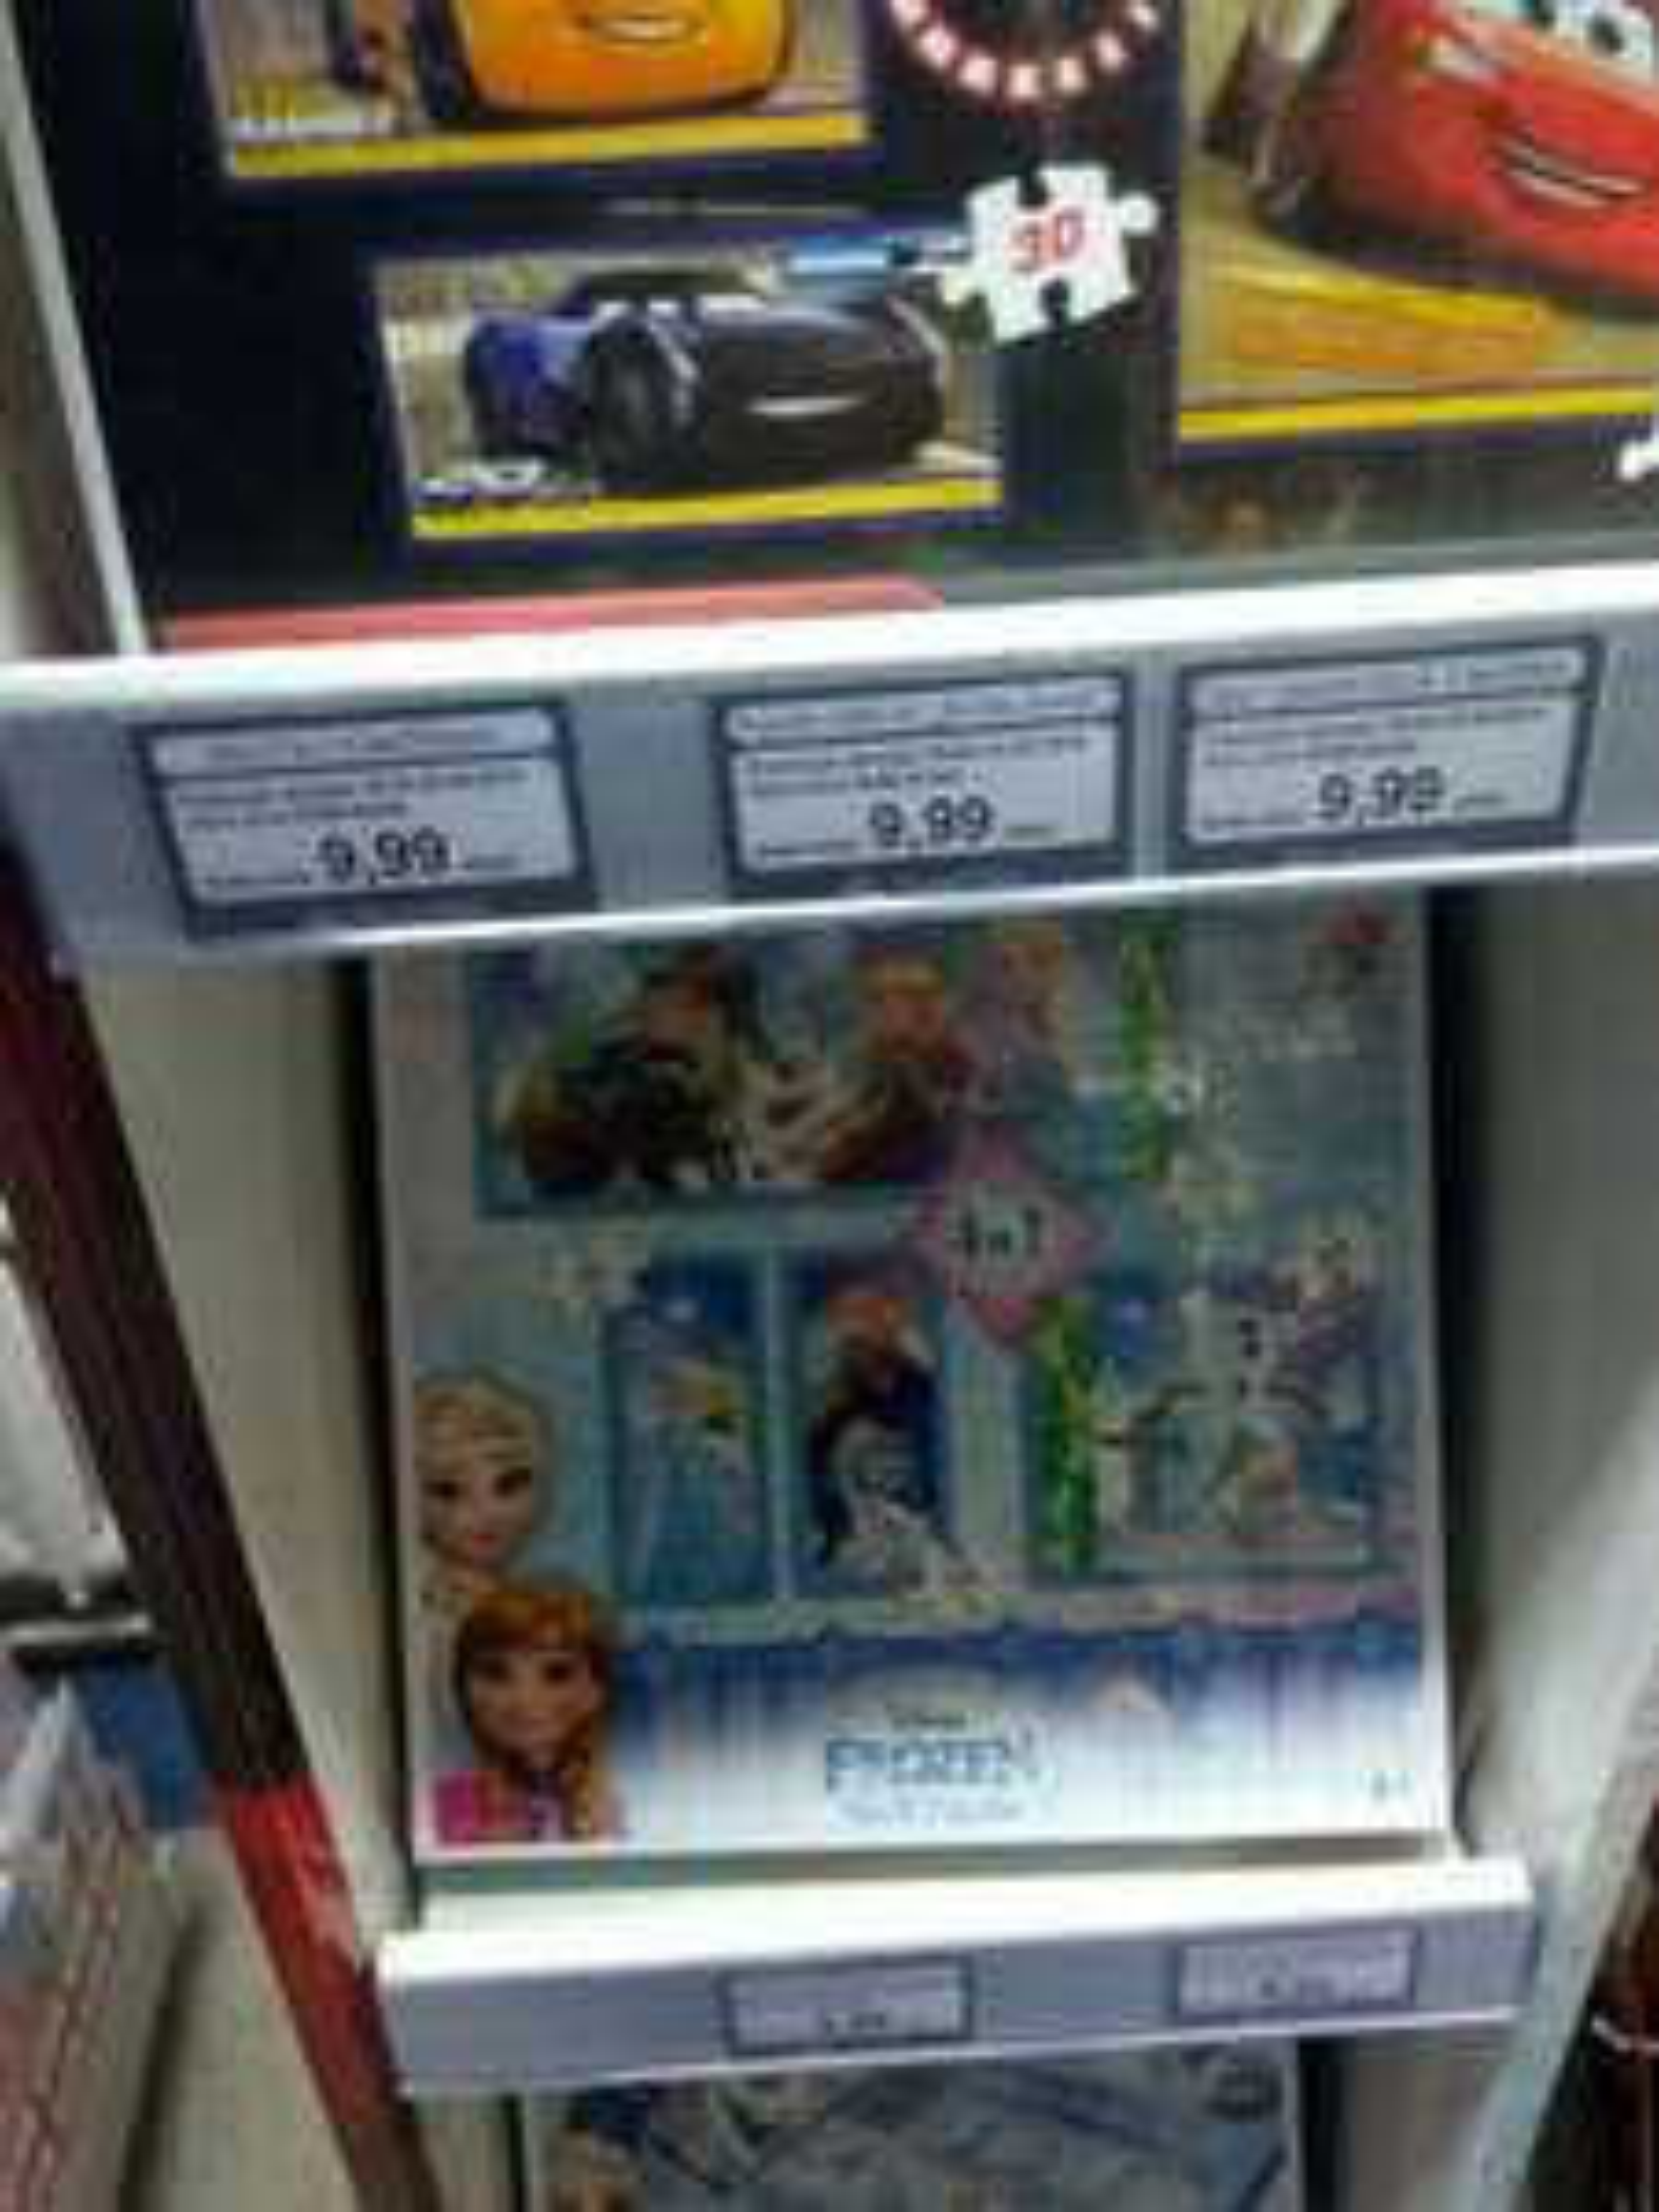 Gry i puzzle trefl Kraina Lodu i Auta / Cars i Frozen / Poczta Polska